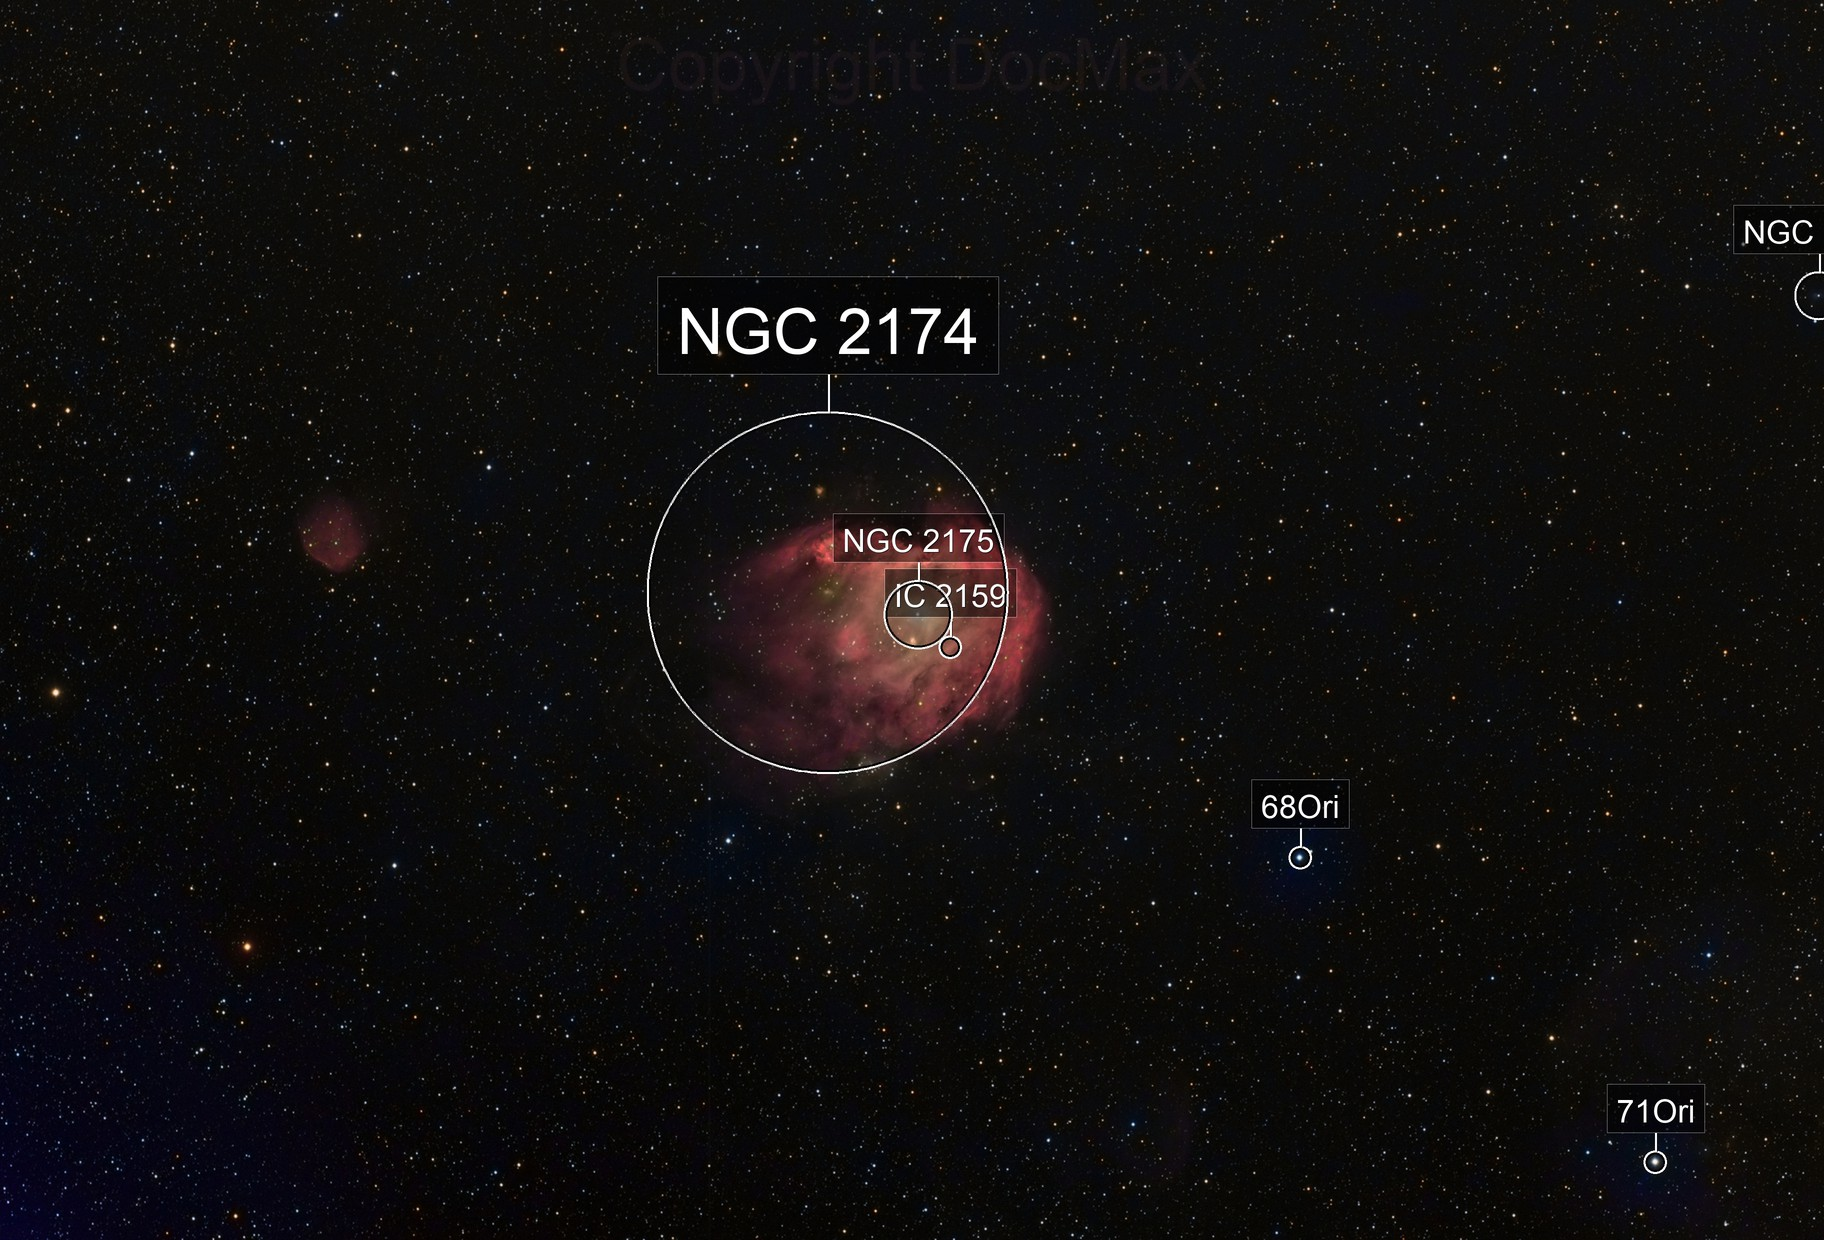 ngc2174 - The Monkey Head Nebula